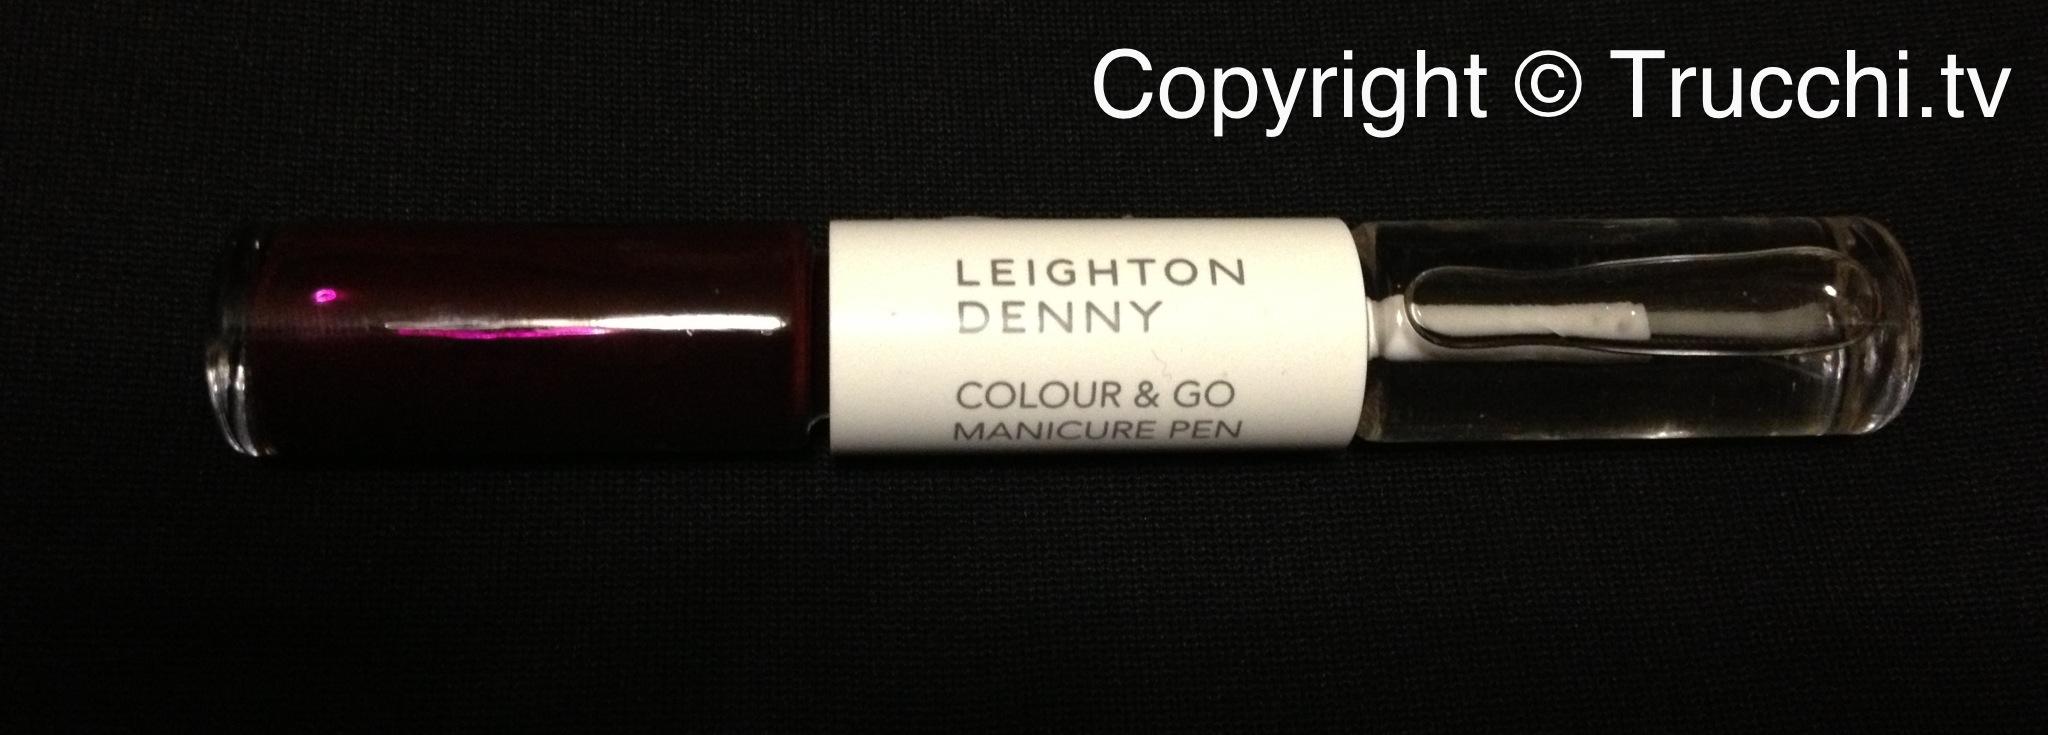 smalto Leighton Denny colour and go manicure pen Vamp